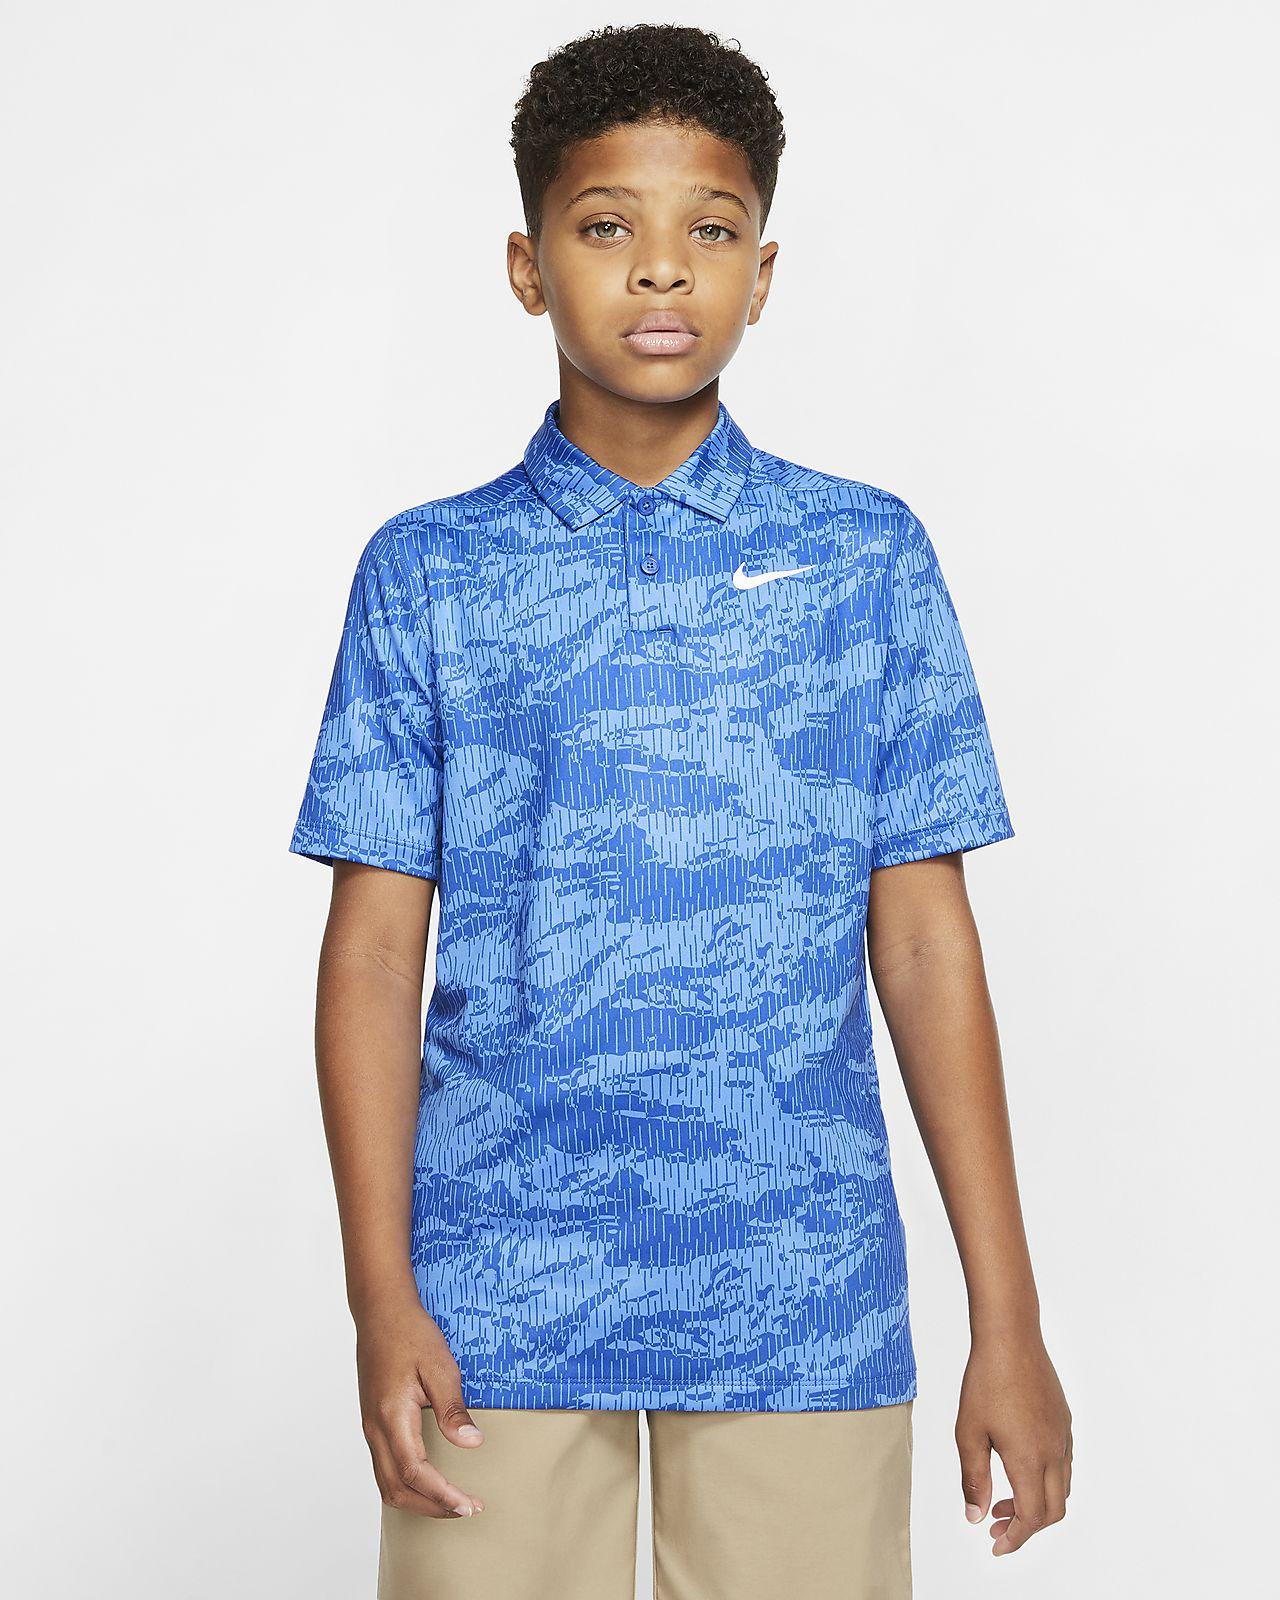 Nike Dri-FIT Boys' Printed Golf Polo